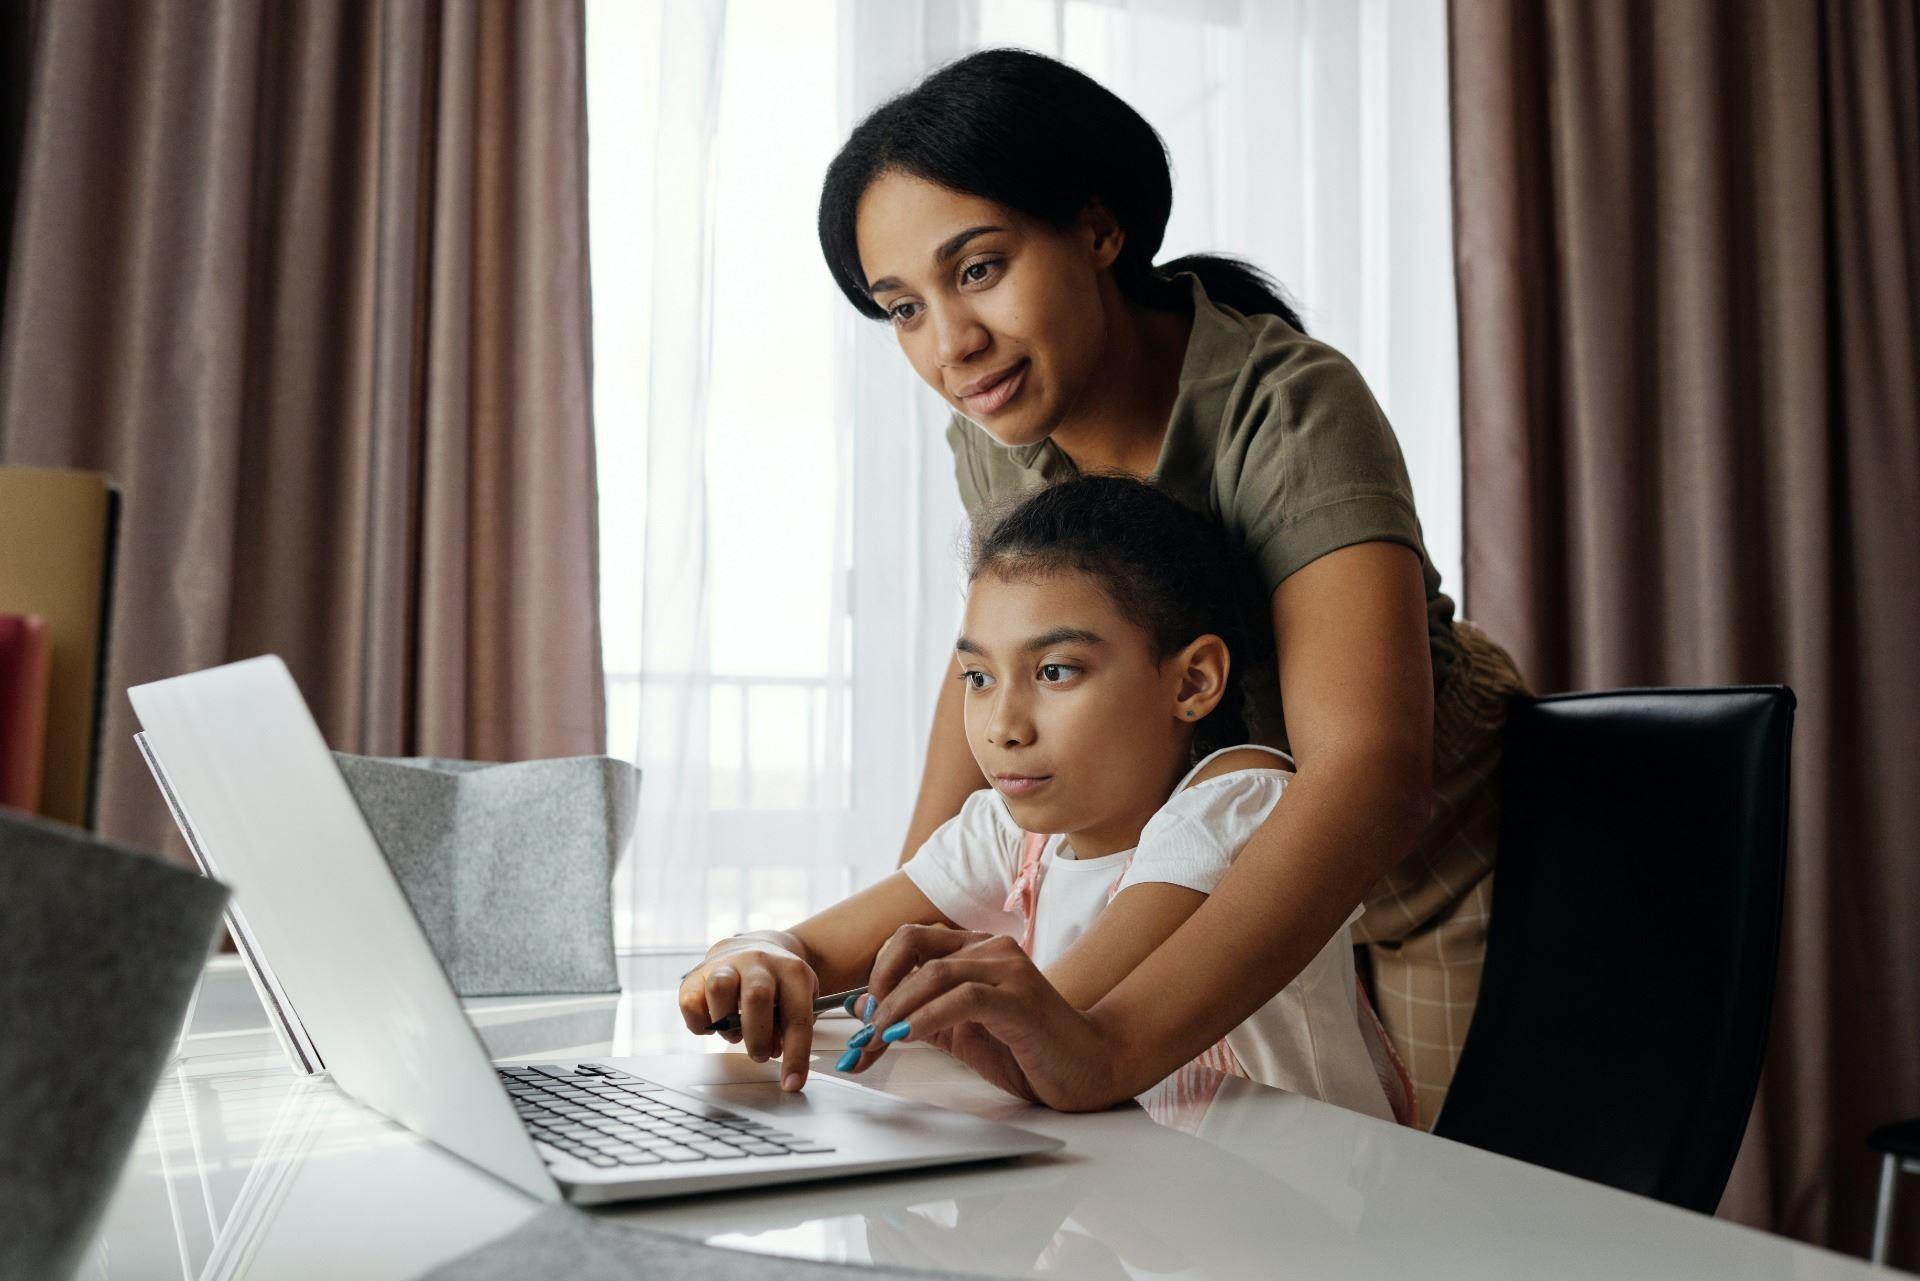 Mom helping girl use computer